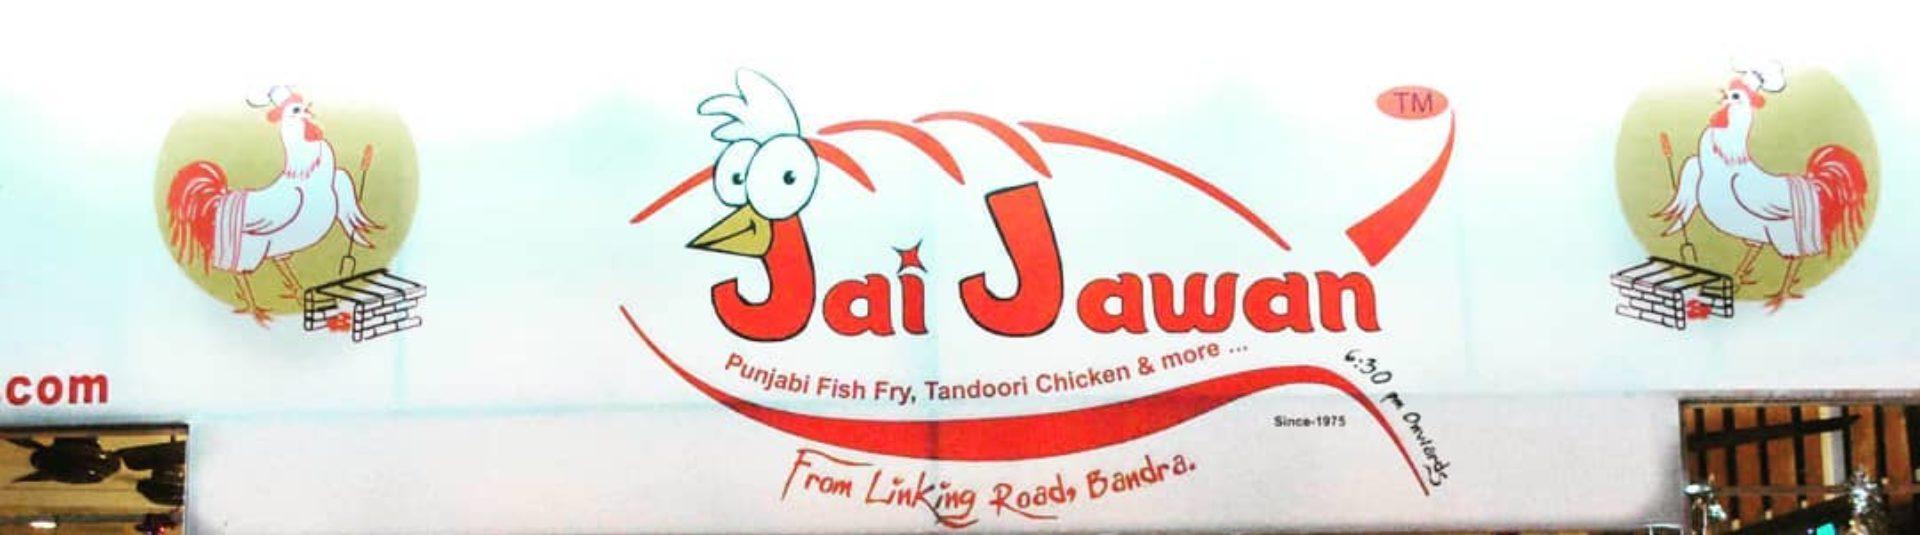 Jai Jawan Foods,Since 1975.